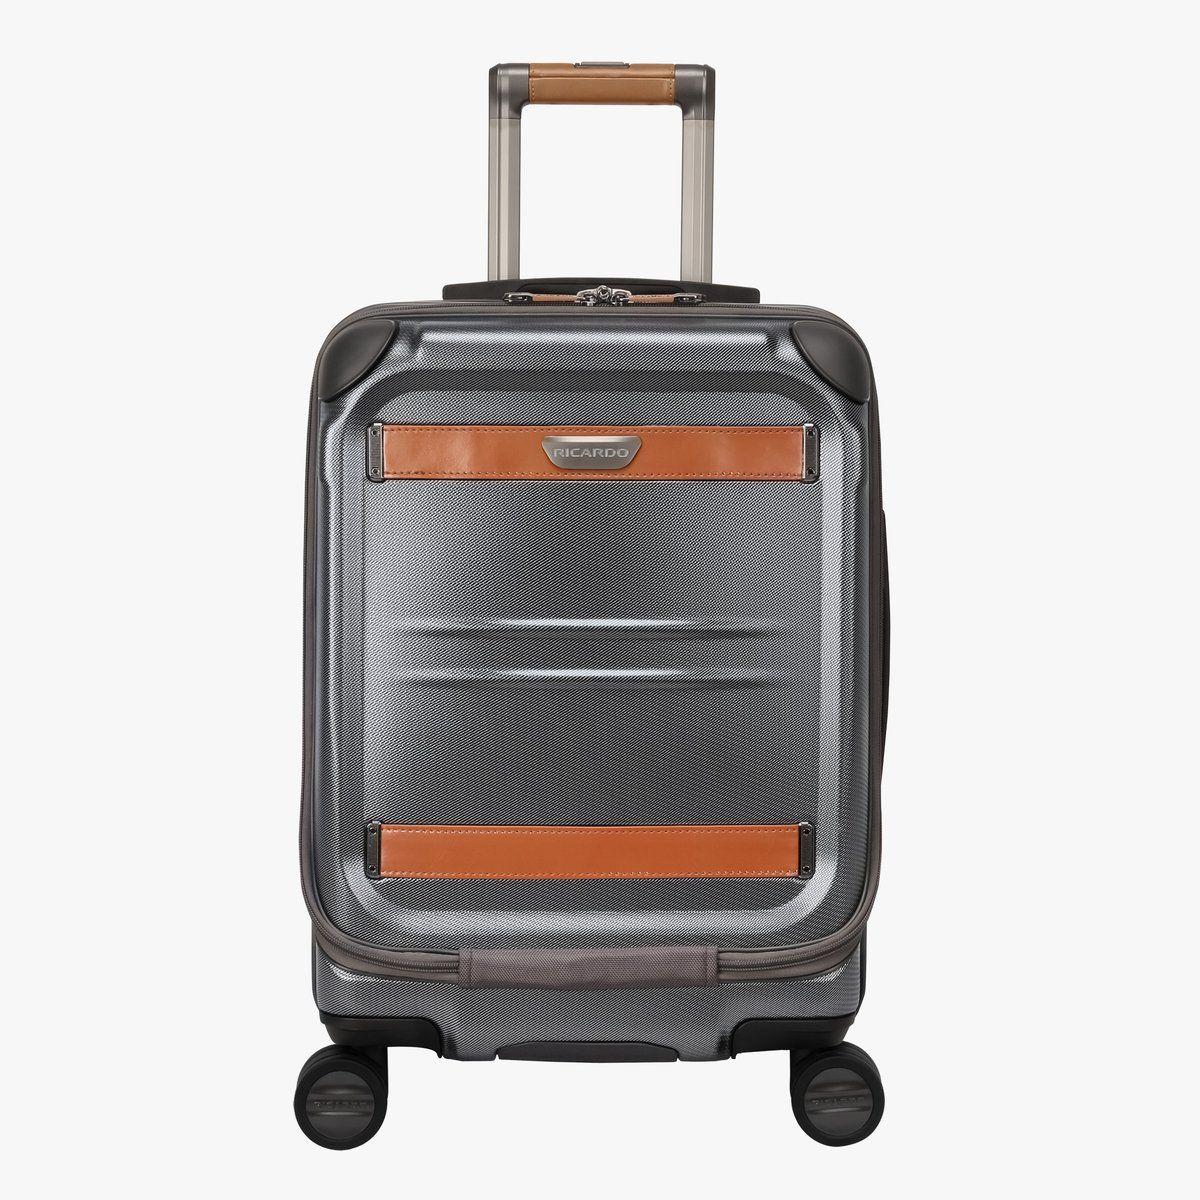 c8d399bce4e6 26 Best Rolling Luggage 2019